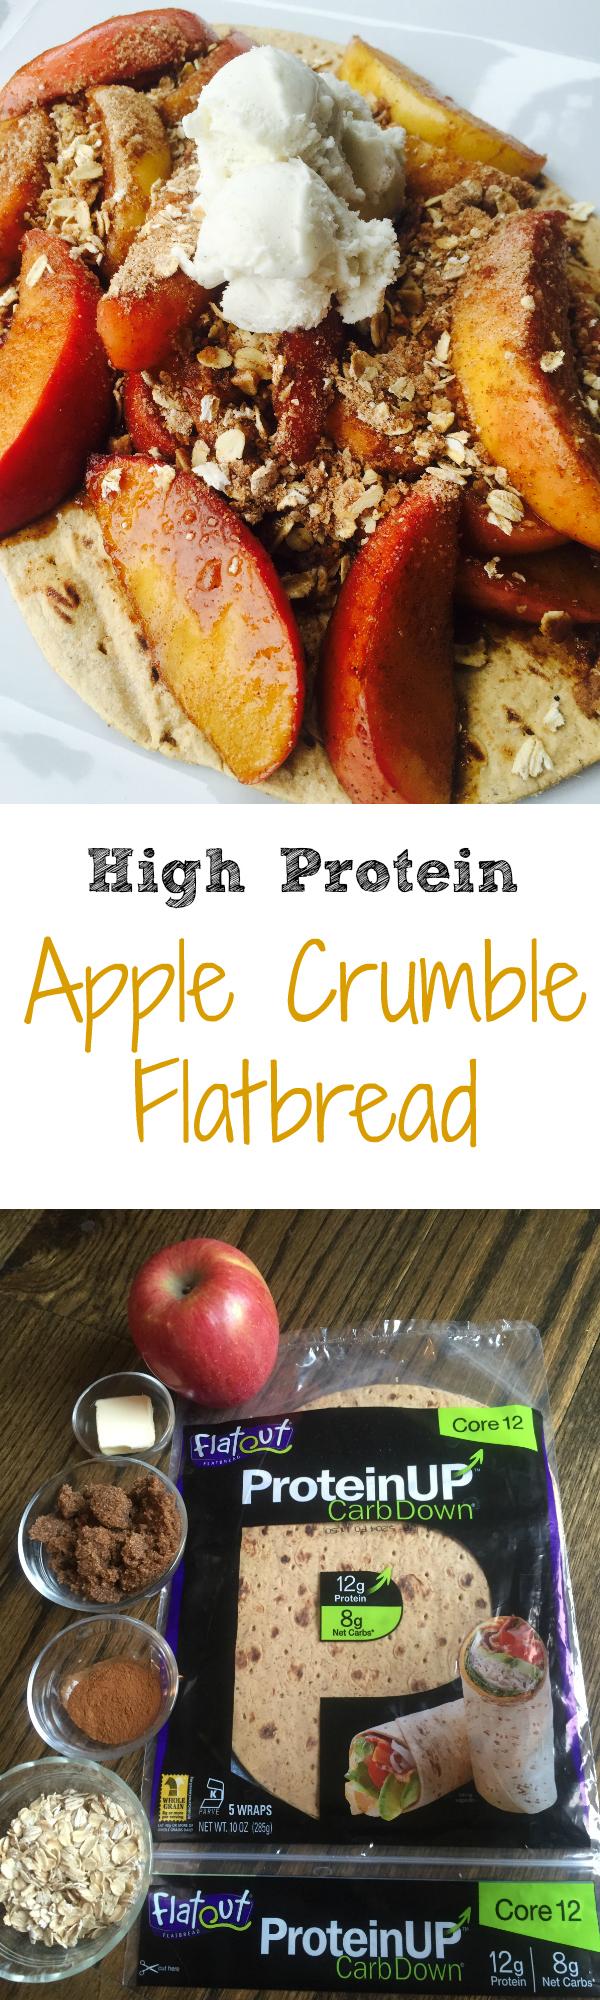 Apple Crumble Flatbread